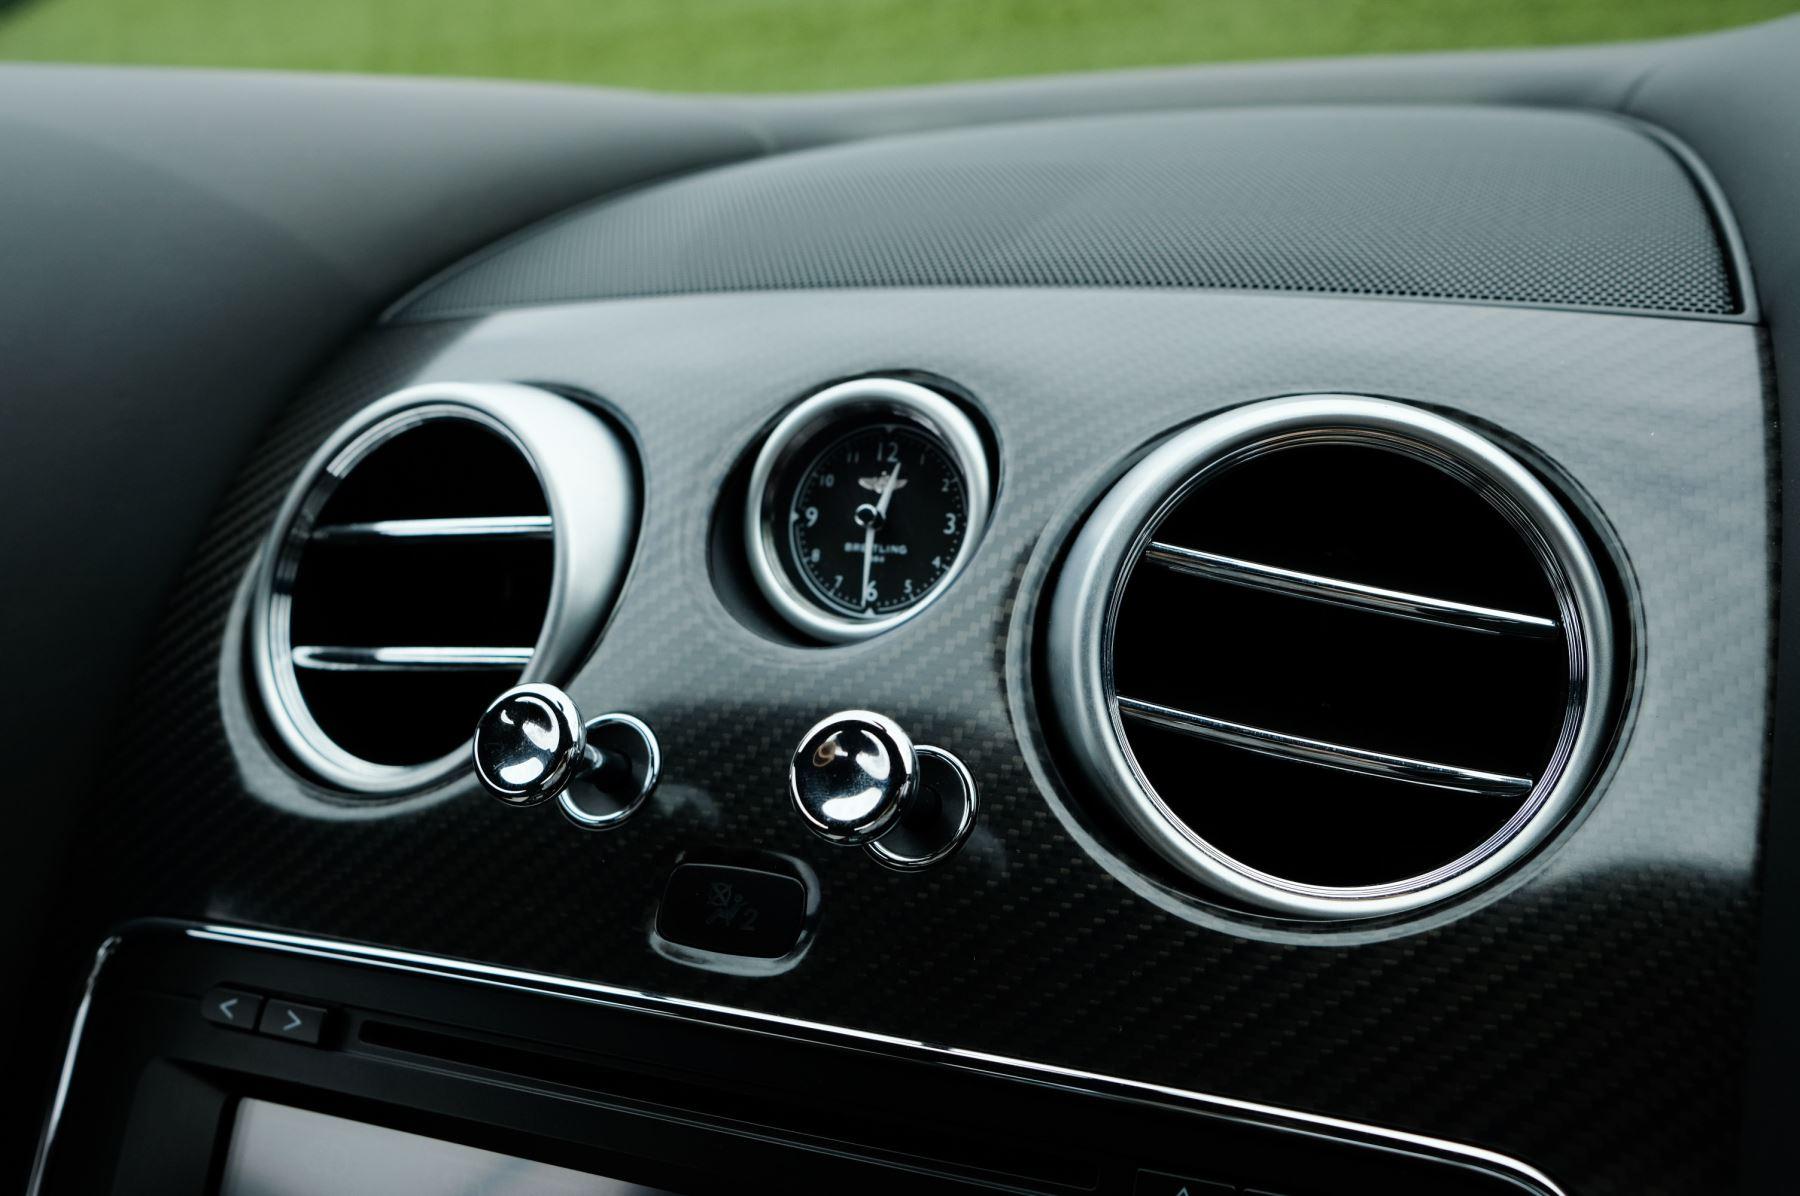 Bentley Continental GT 6.0 W12 [635] Speed - Premier Specification - Carbon Fibre Fascia Panels image 23